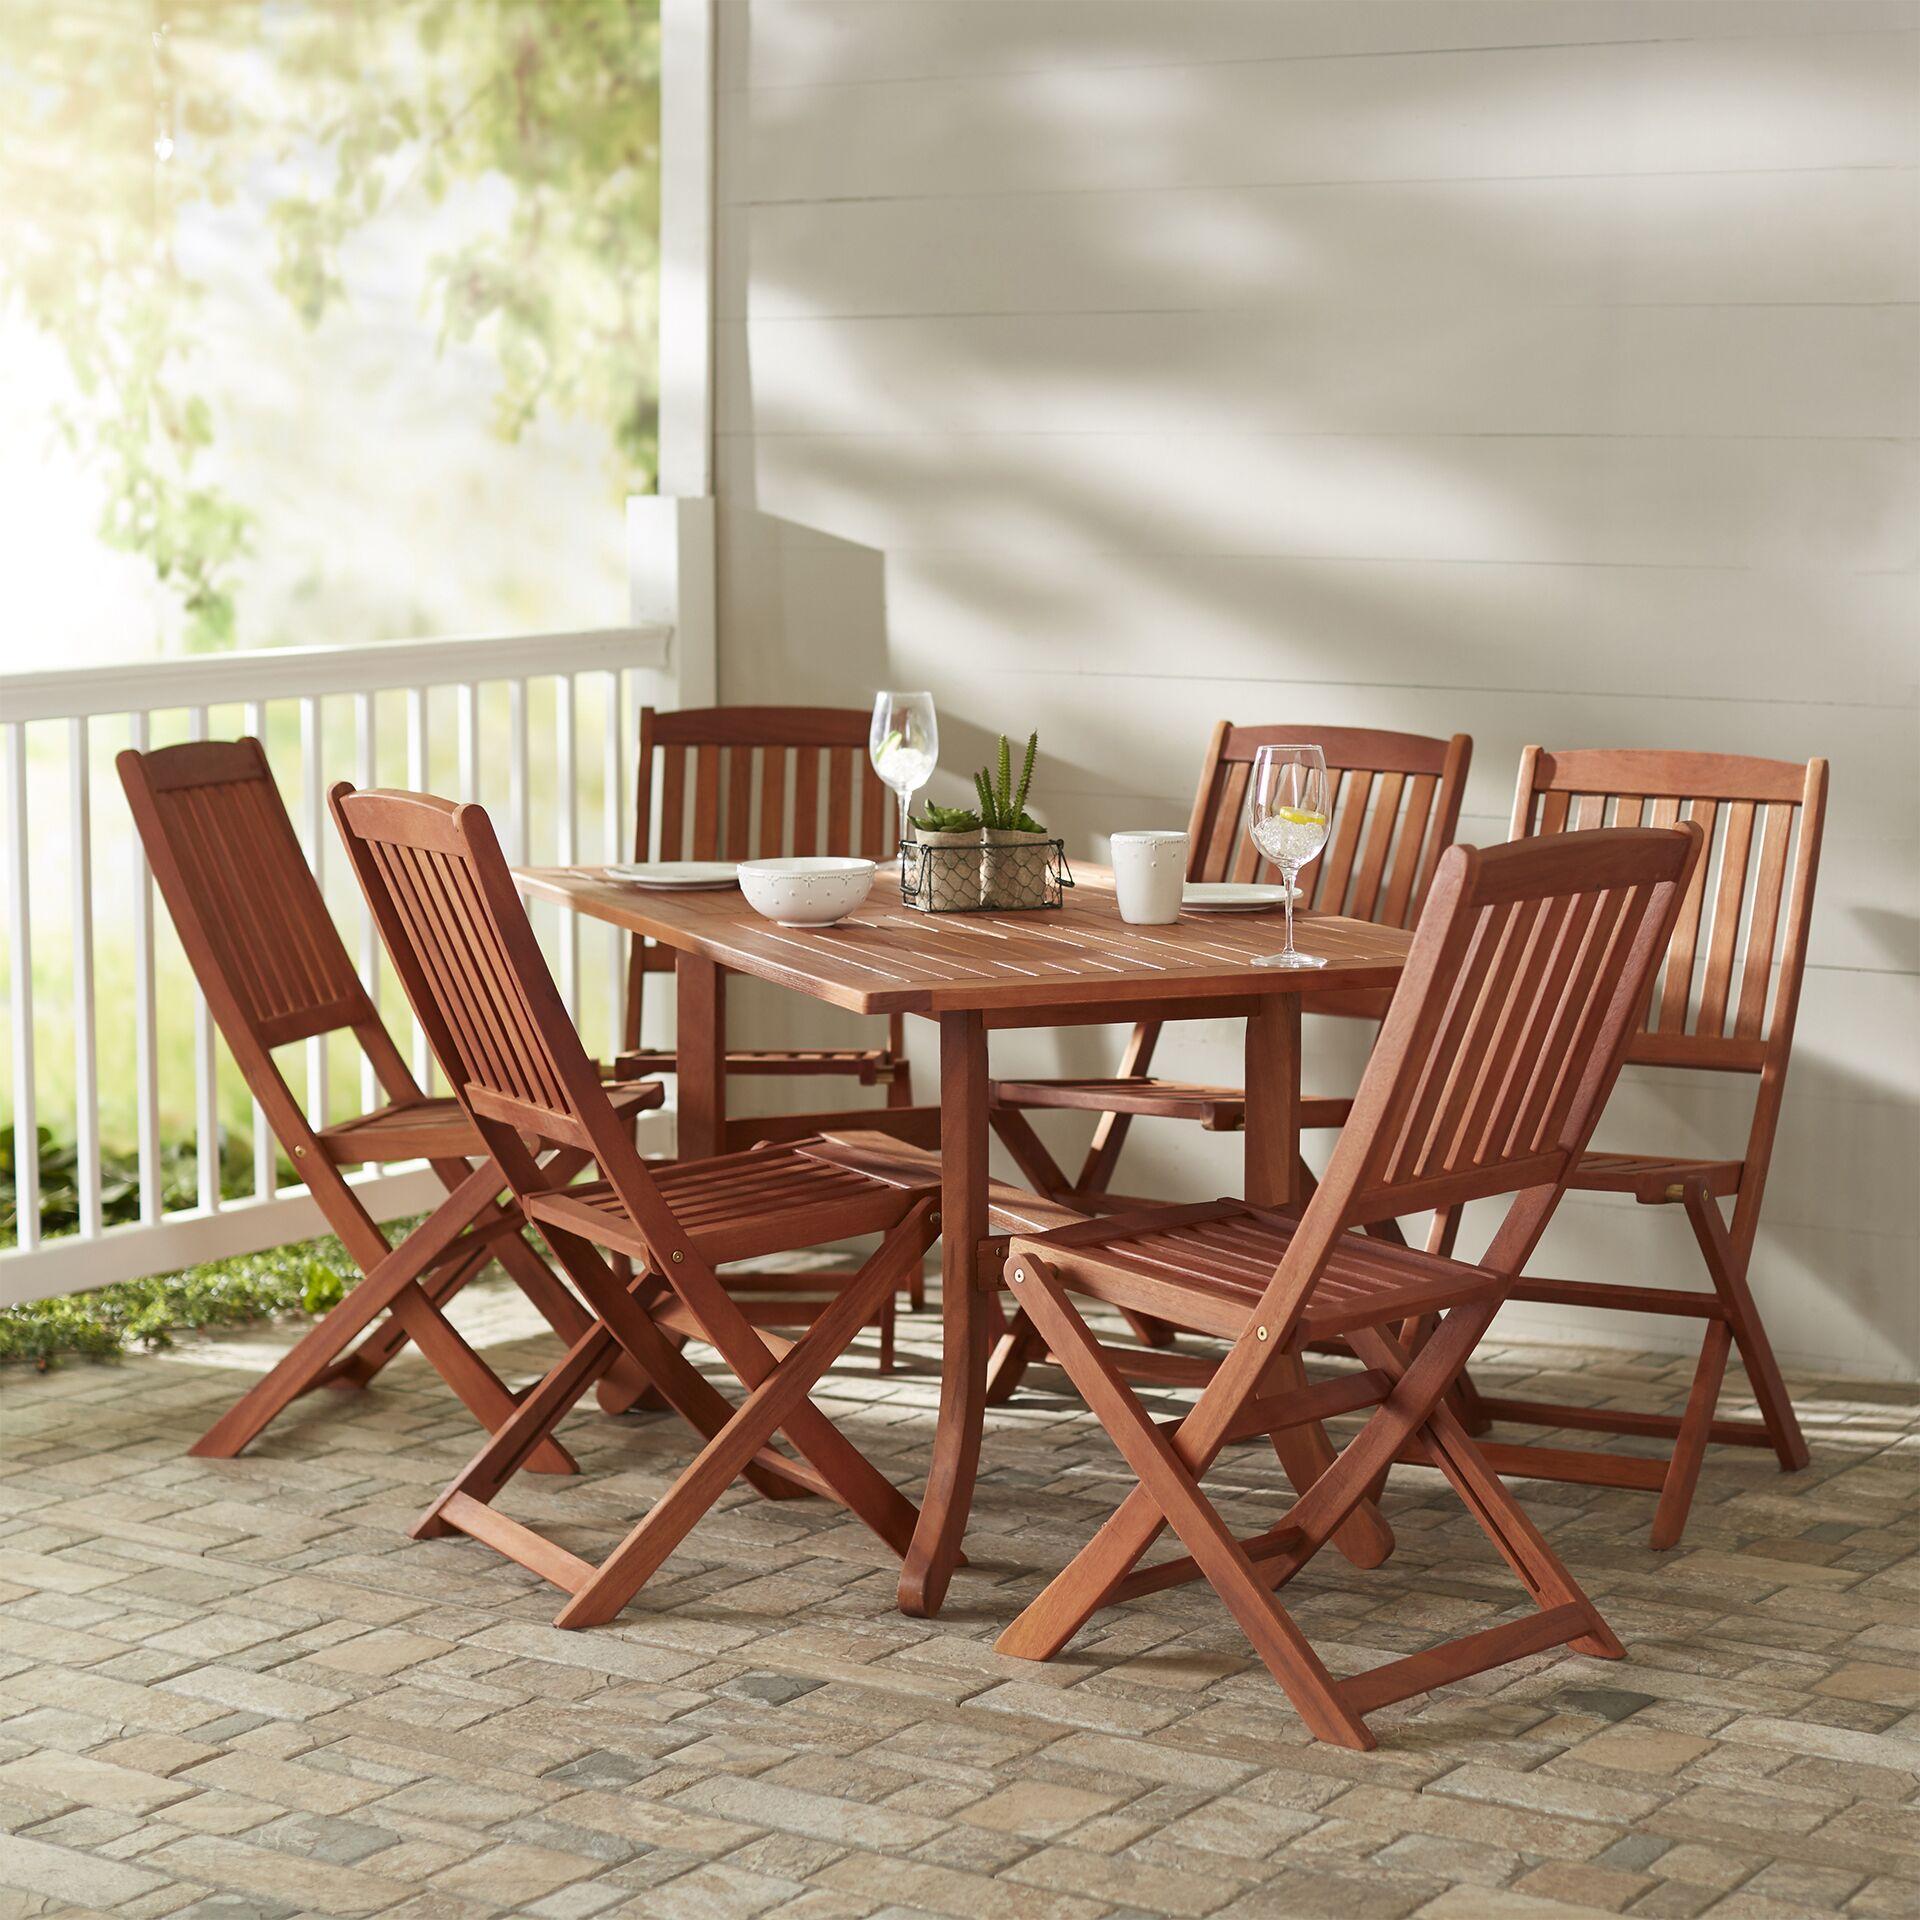 Monterry 7 Piece Rectangular Wood Dining Set